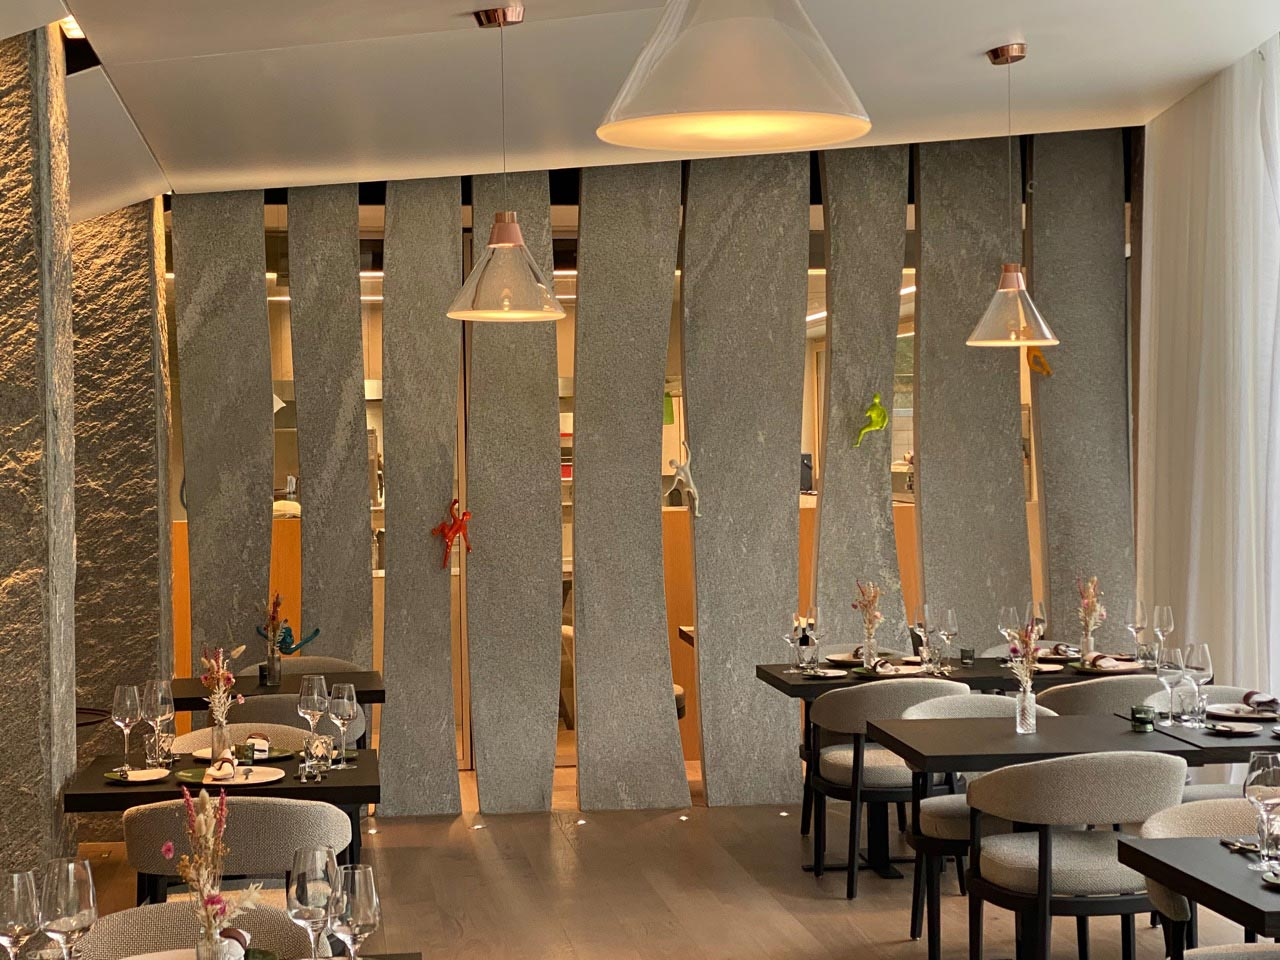 ES Aca 5760 restaurant hor 20 08 022 - Restaurant le 1465 du Club Alpin